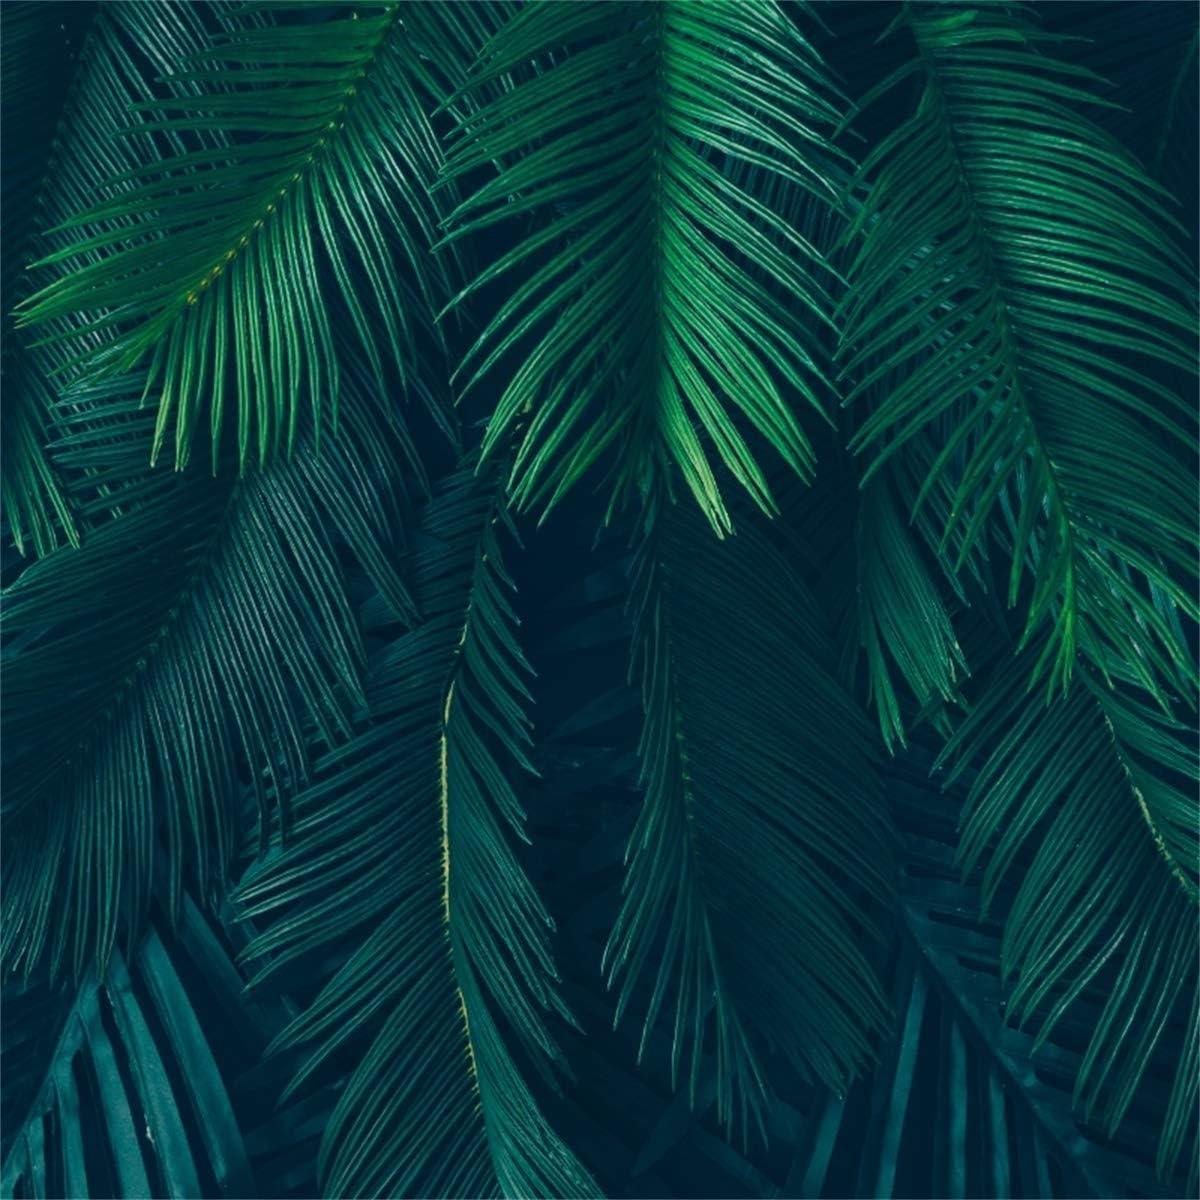 YEELE 10x10ft Dark Green Jungle Leaves Backdrop Tropical Safari Themed Birthday Photography Background Luau Theme Party Summer Hawaiian YouTube Videos Kids Adults Portrait Photobooth Props Wallpaper